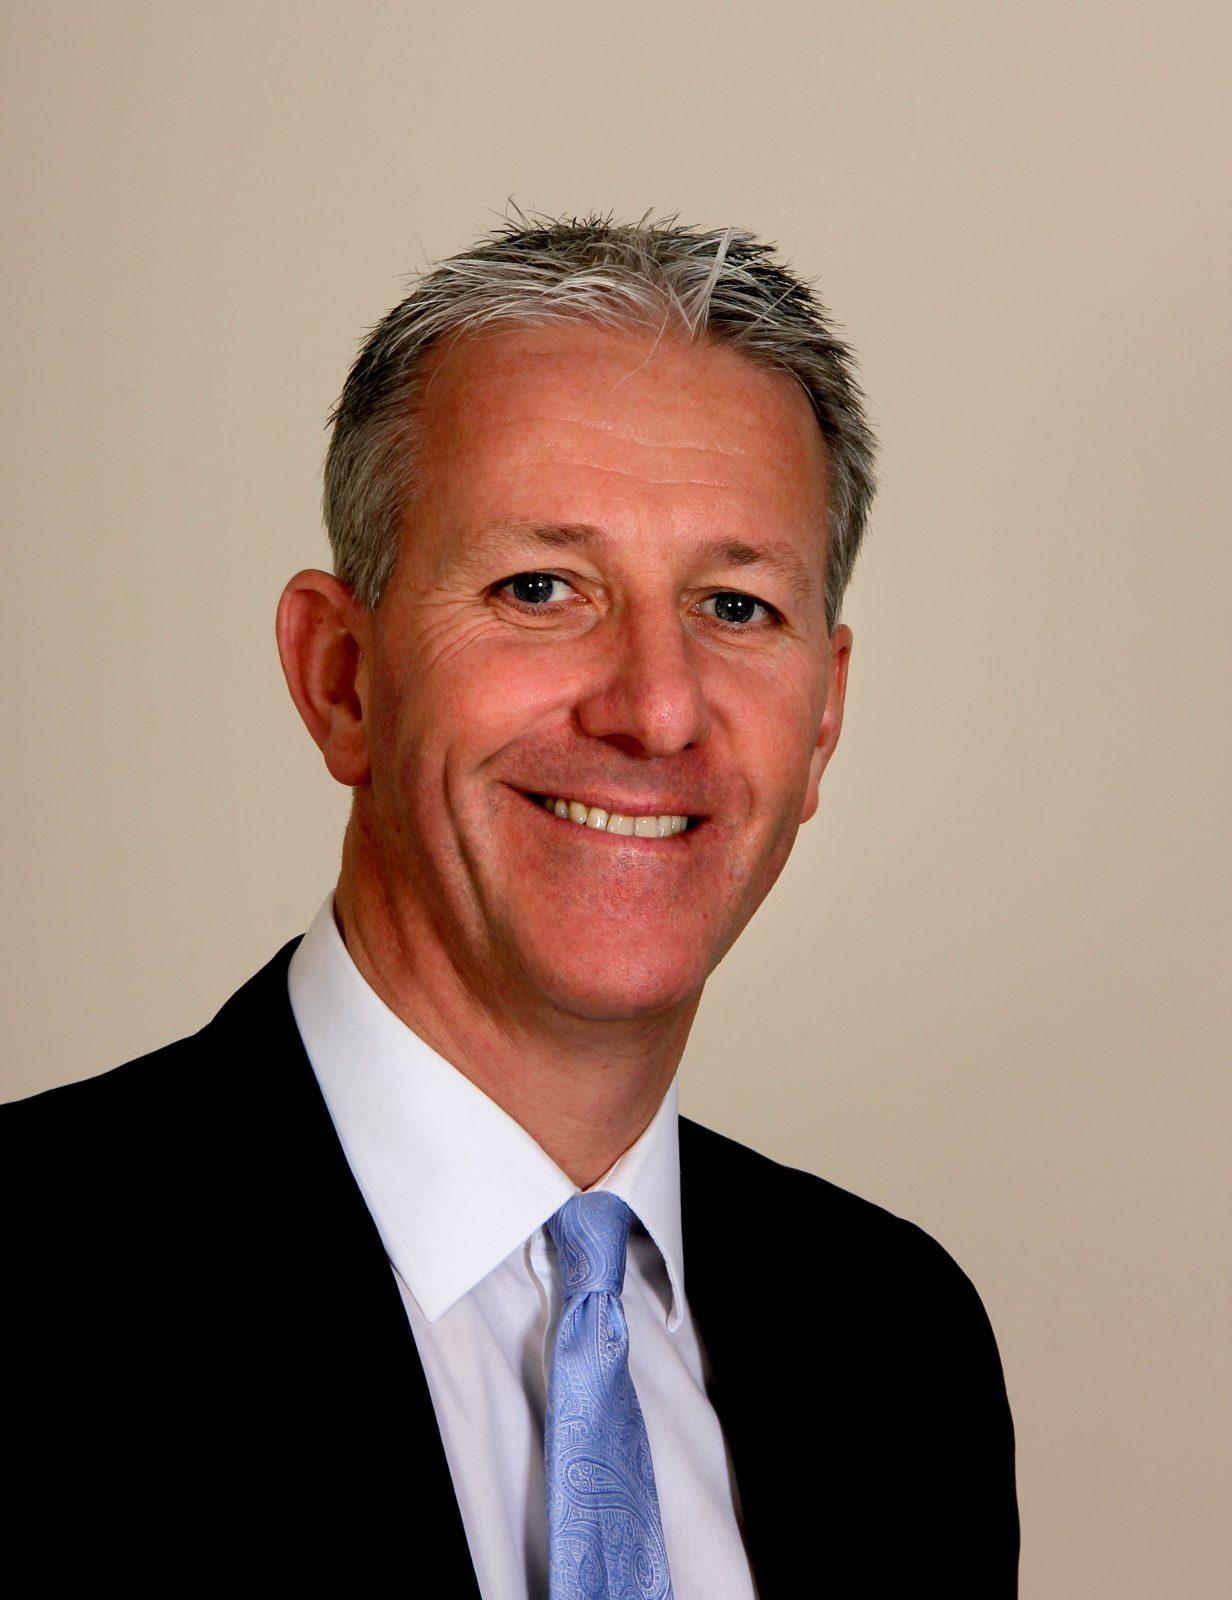 Keith Sadler, Managing Director at Vista Panels Ltd - the award winning composite door supplier in the UK